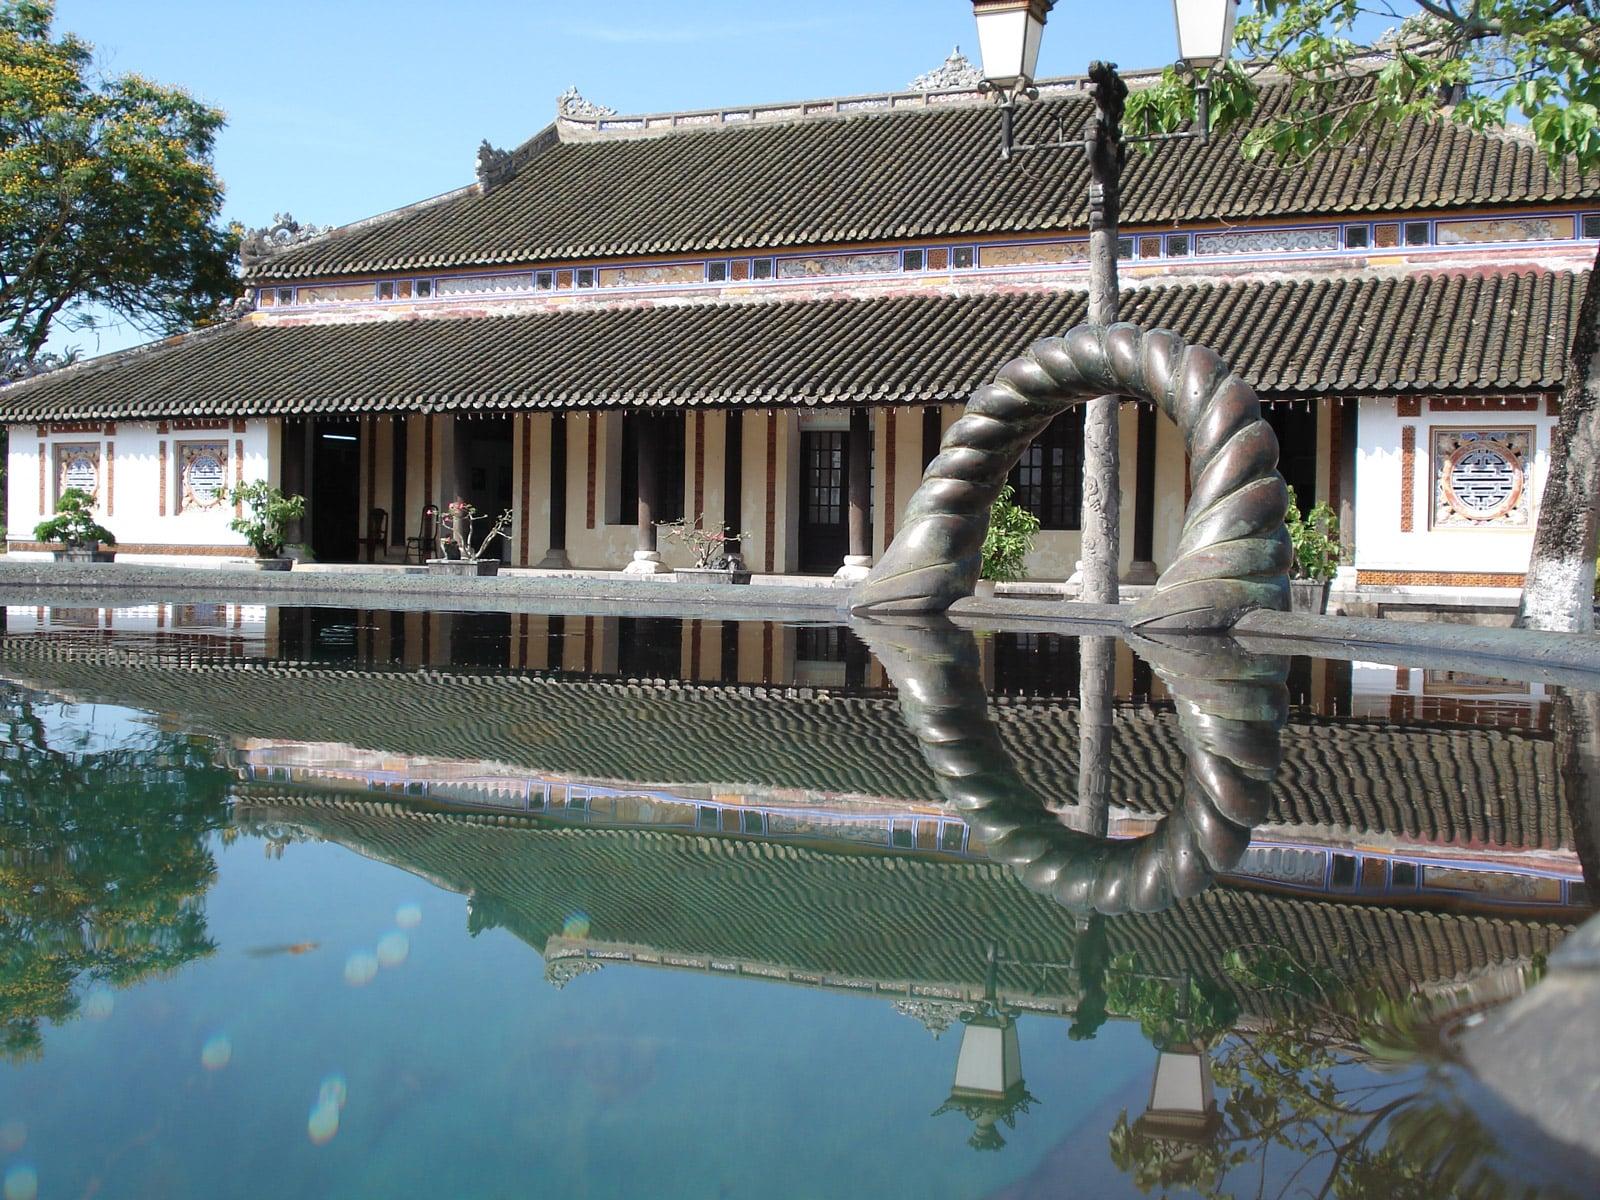 rondreis vietnam hue hoogtepunt 6